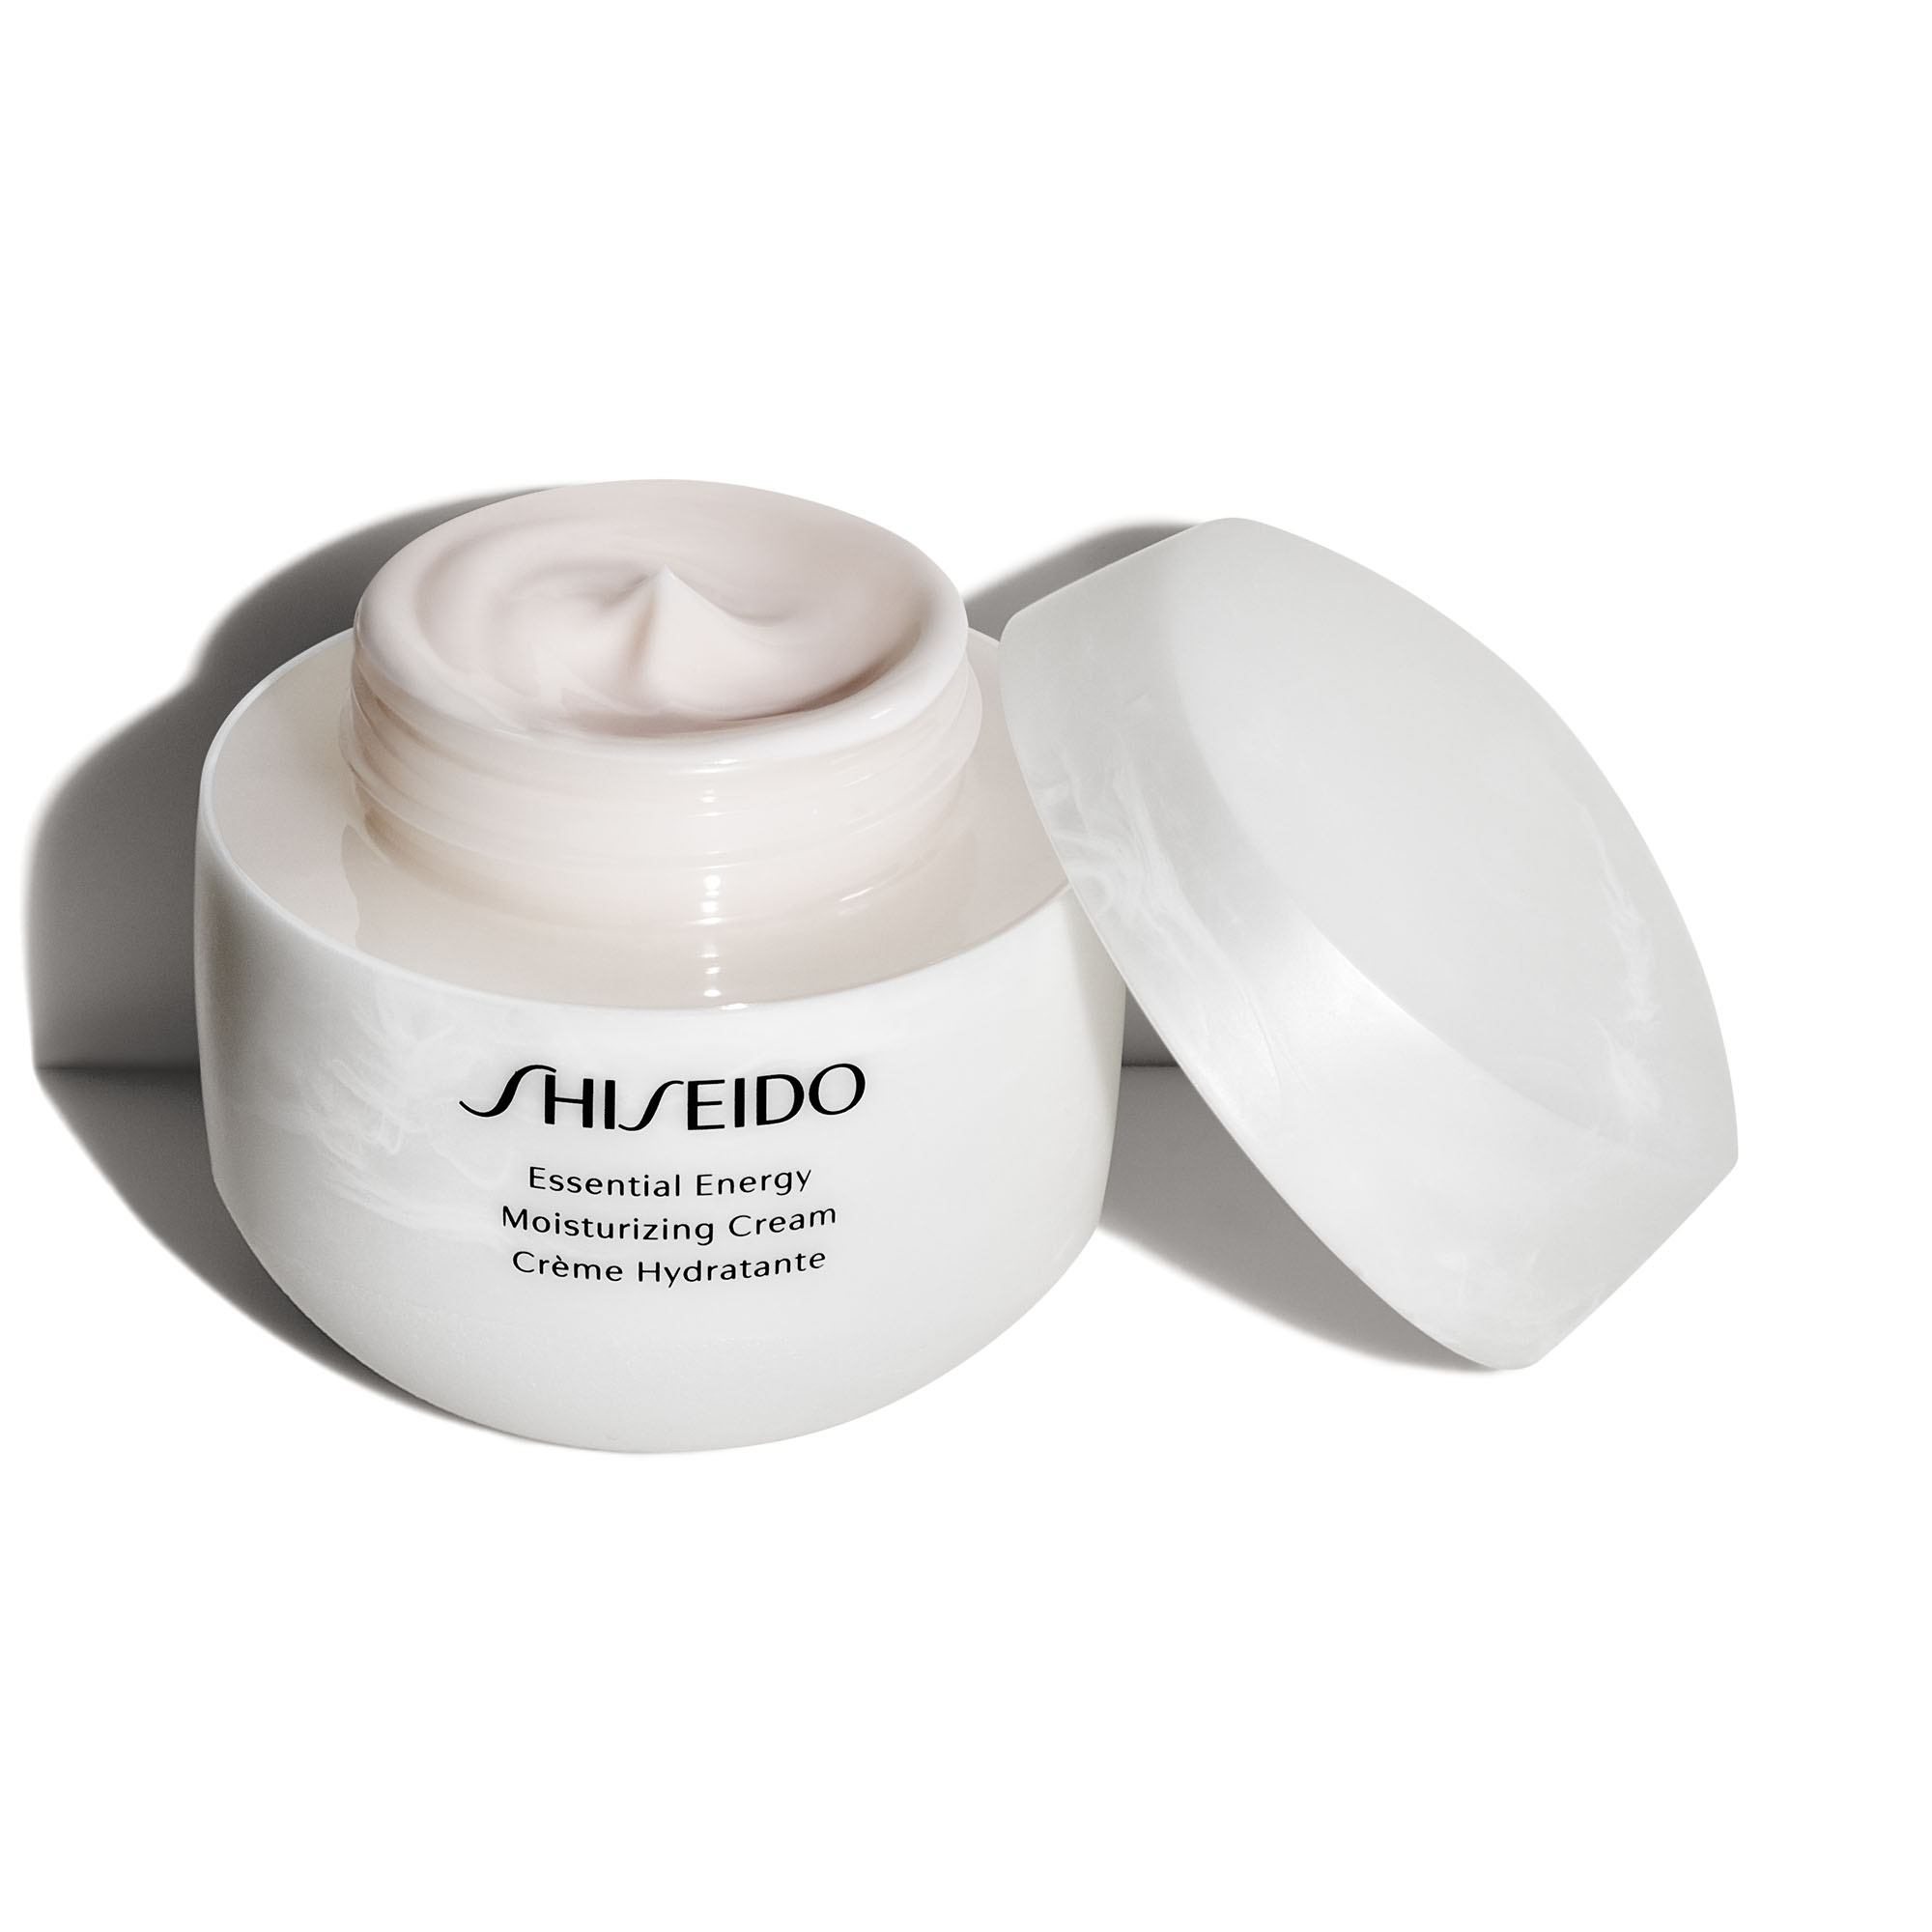 essential_energy_ss18_moisturising_cream_50ml_open-rgb_web-2000px-300dpi.jpg